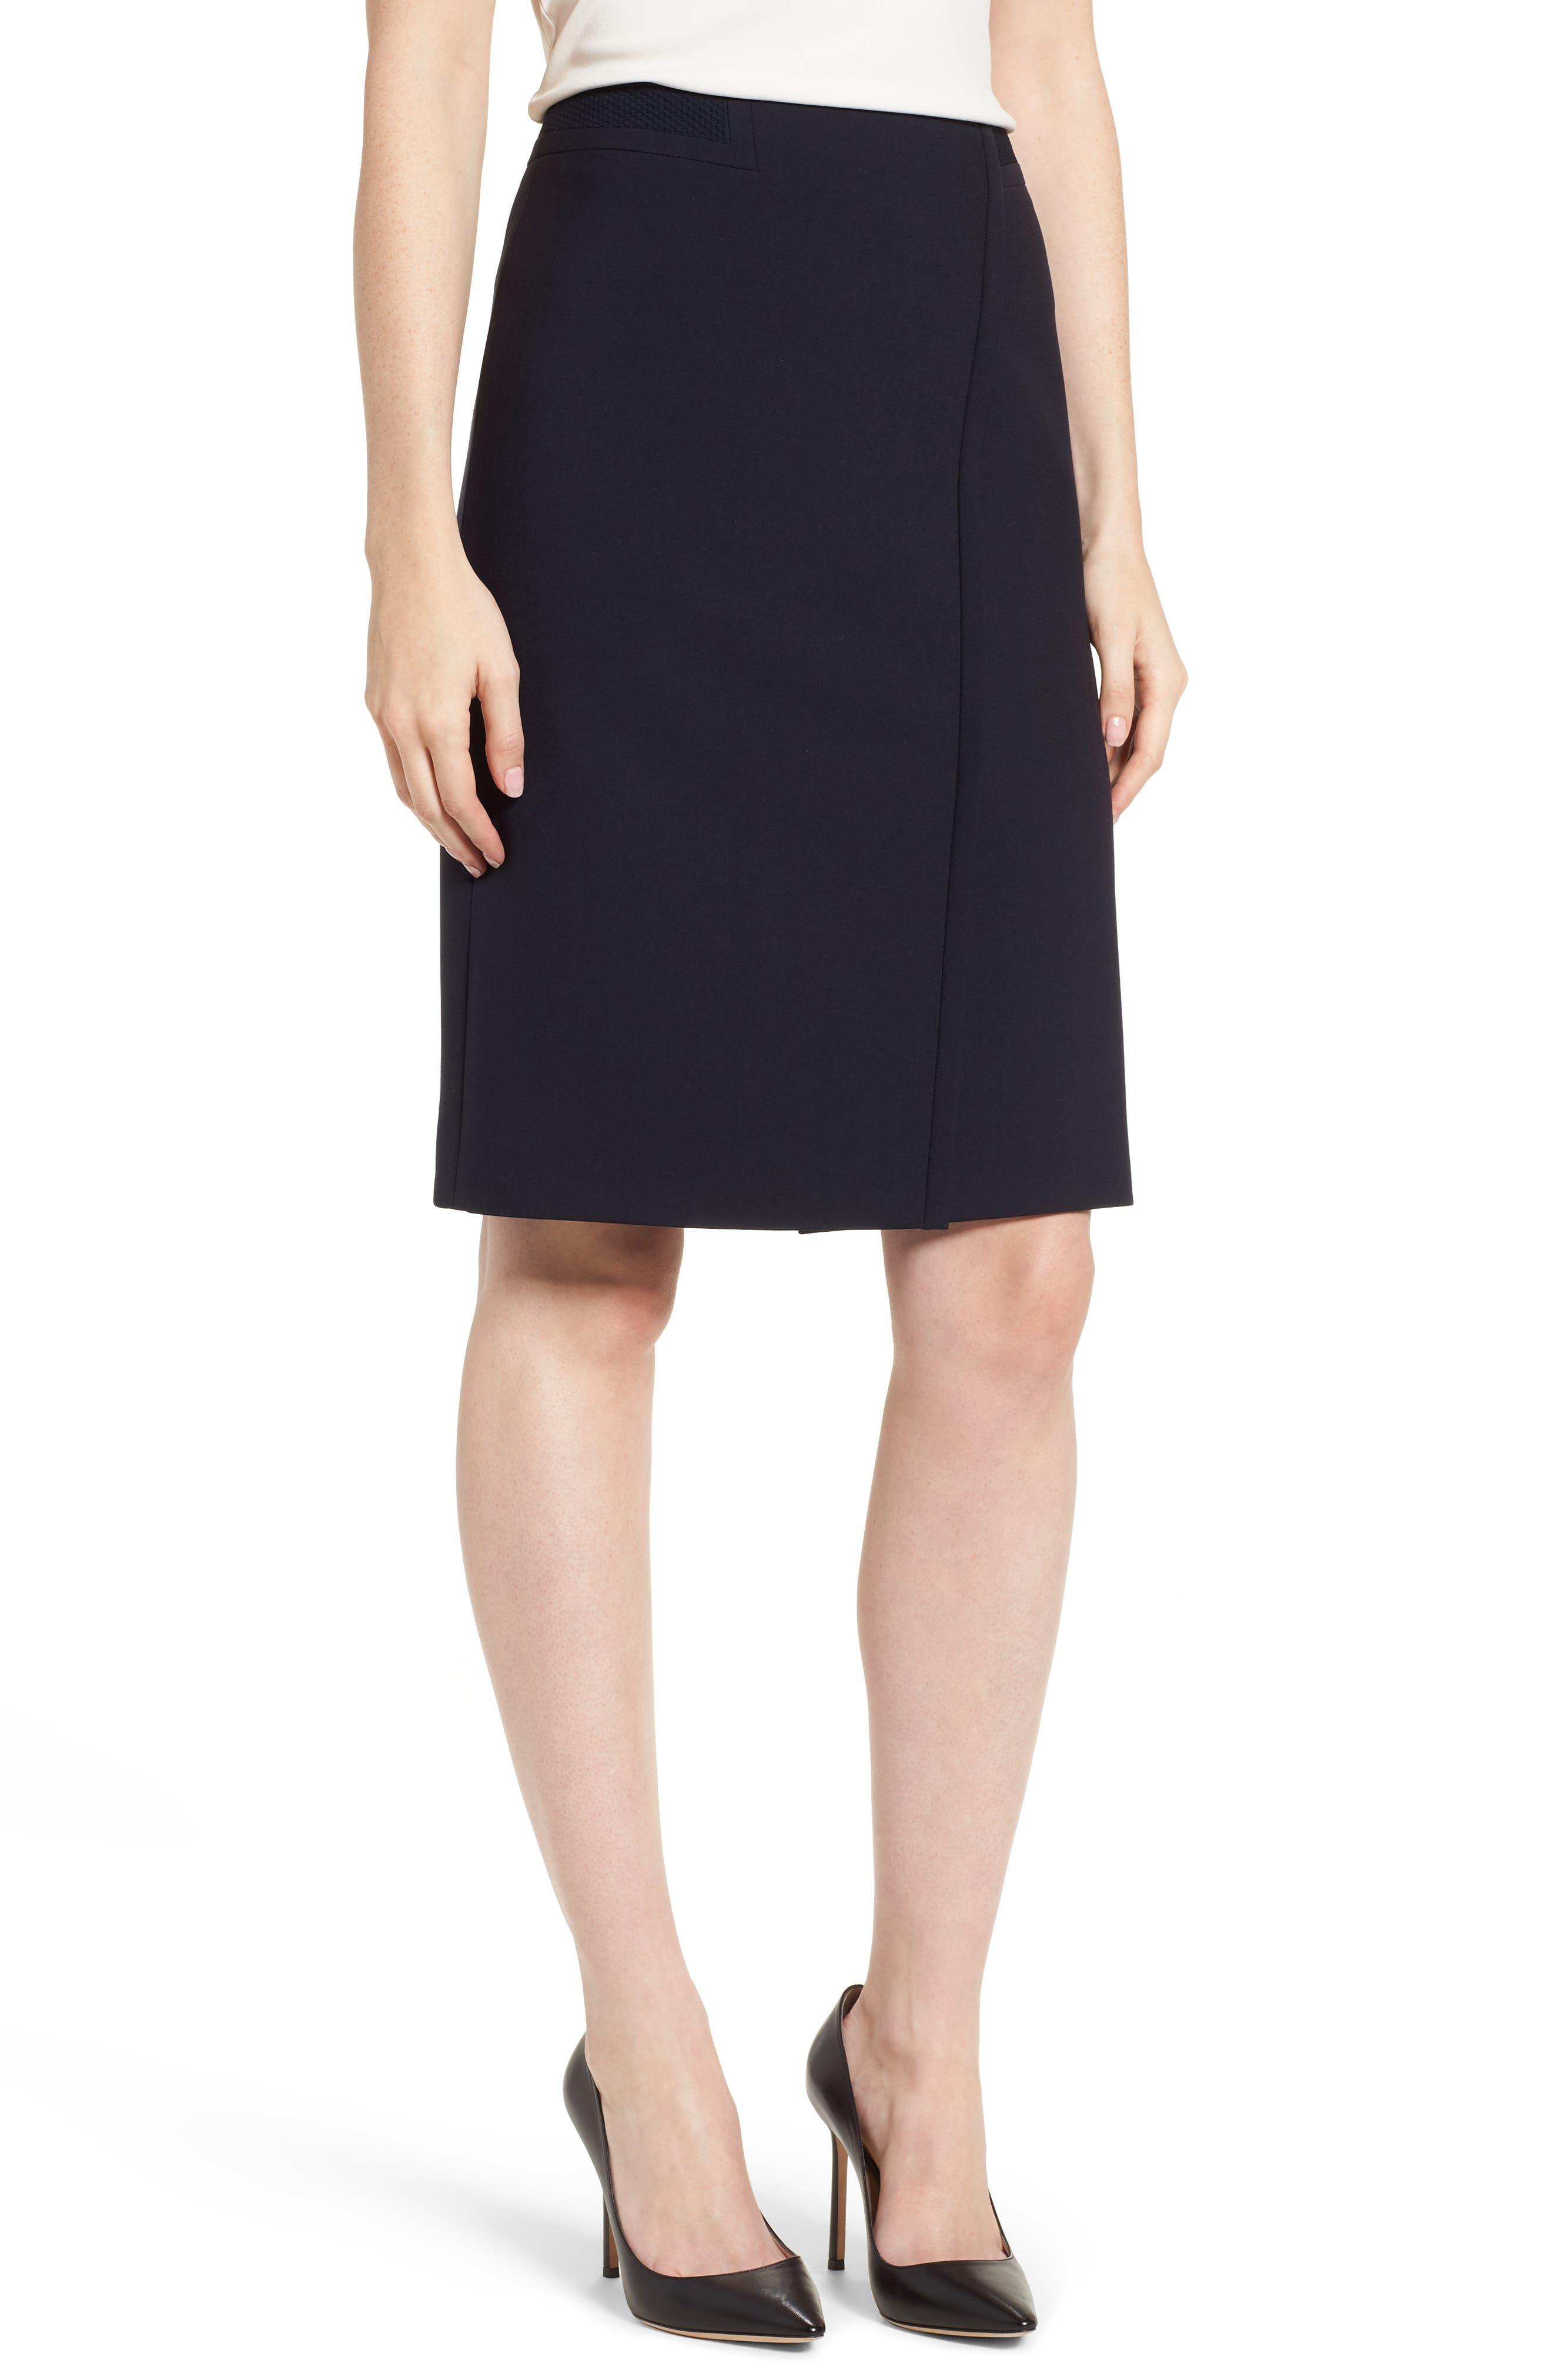 Vadama Ponte Pencil Skirt,                             Main thumbnail 1, color,                             480